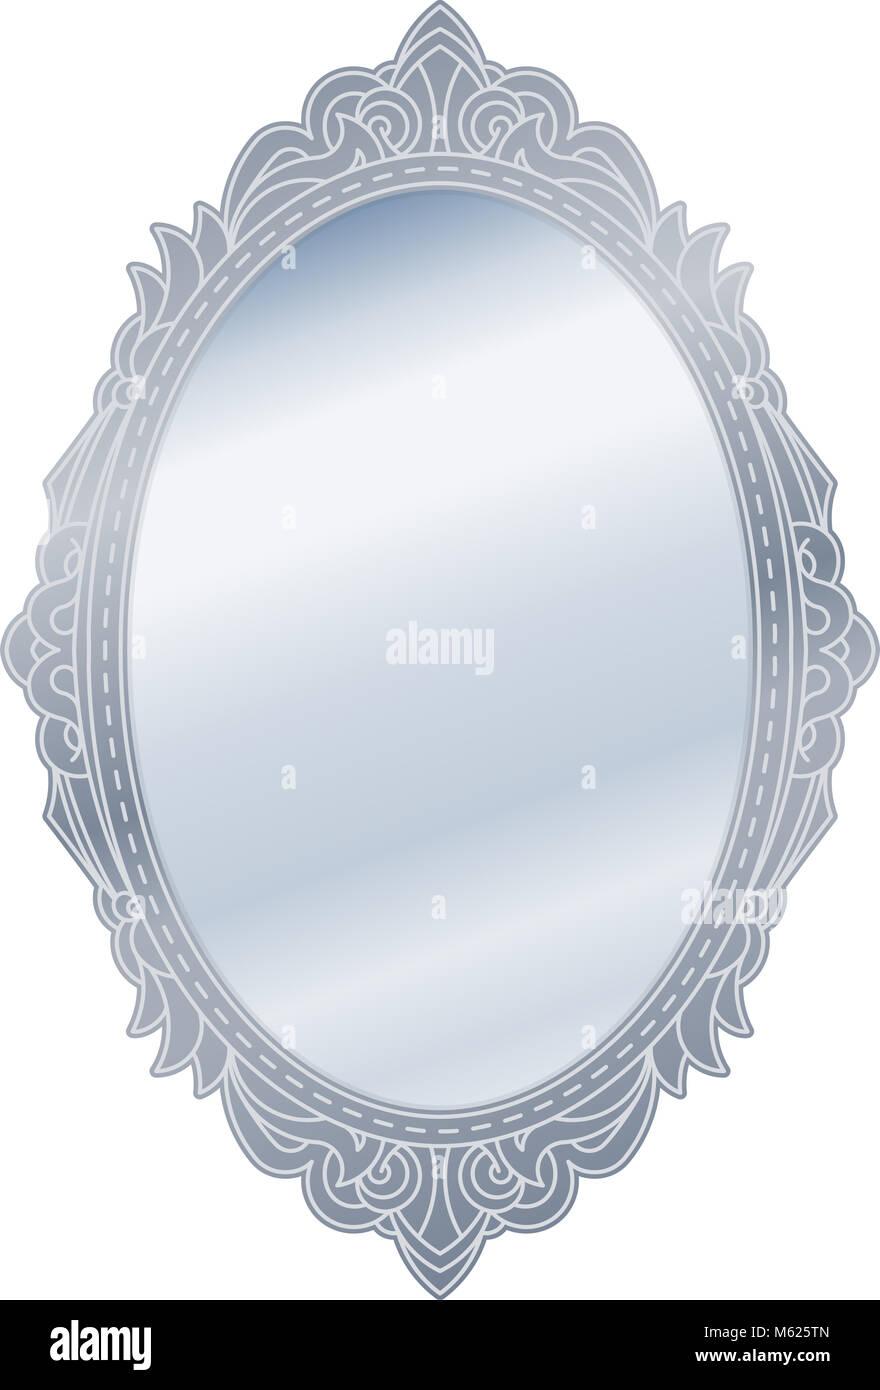 Antique oval frame ornate Gold Mirror In Retro Vintage Oval Ornate Silver Border Frame Vector Illustration Alamy Mirror In Retro Vintage Oval Ornate Silver Border Frame Vector